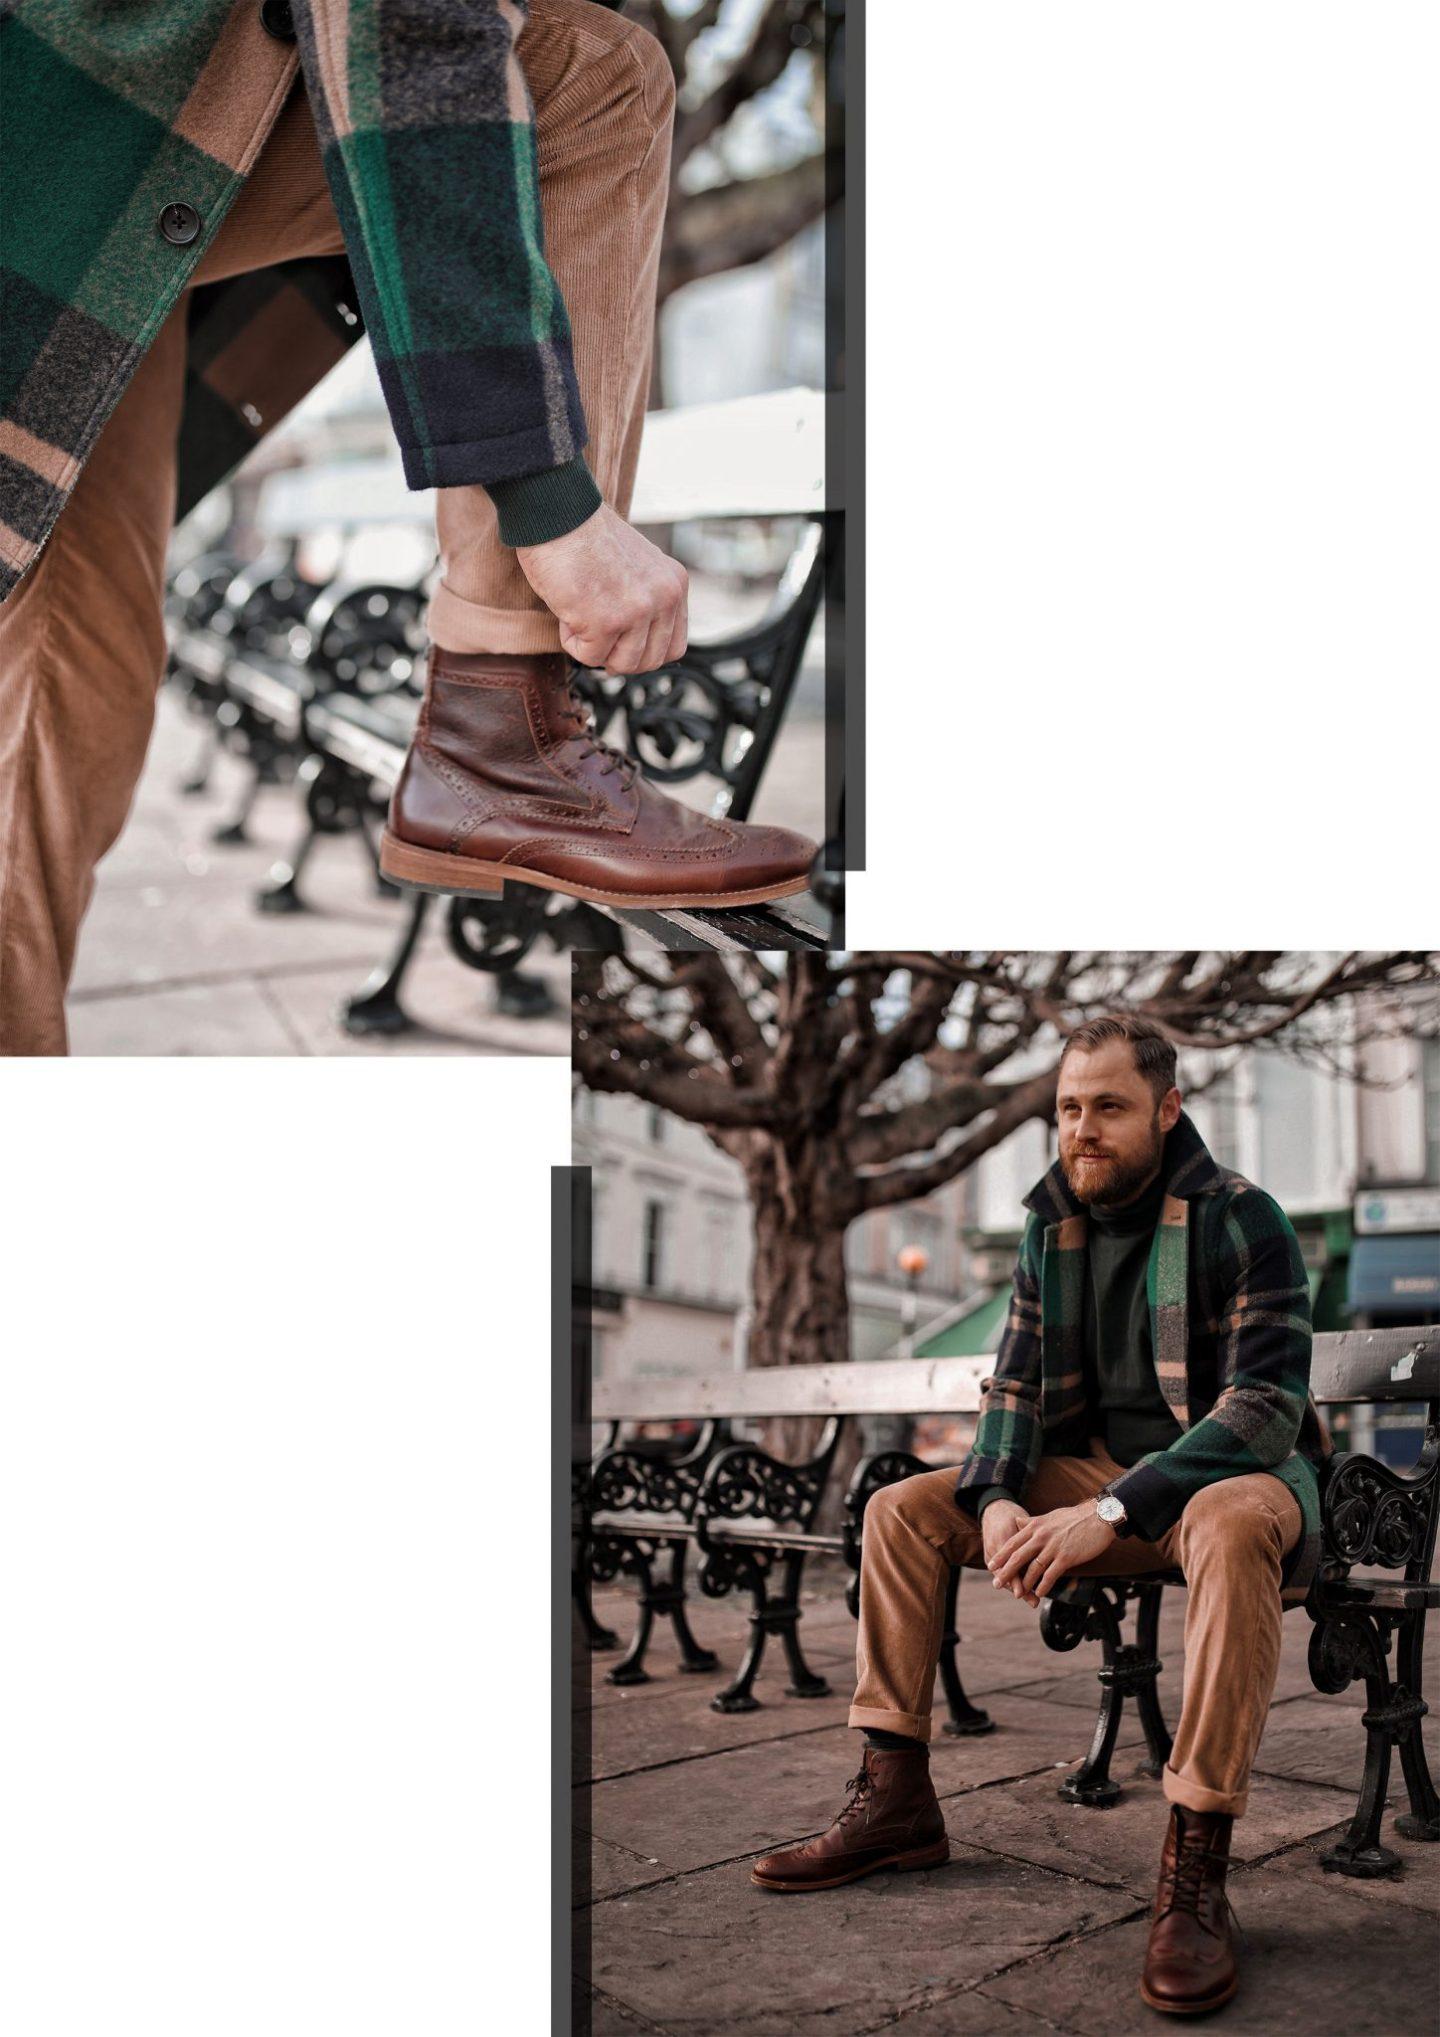 ASOS Coat Farah Menswear Chinos Barbour Boots Twenty First Century Gent